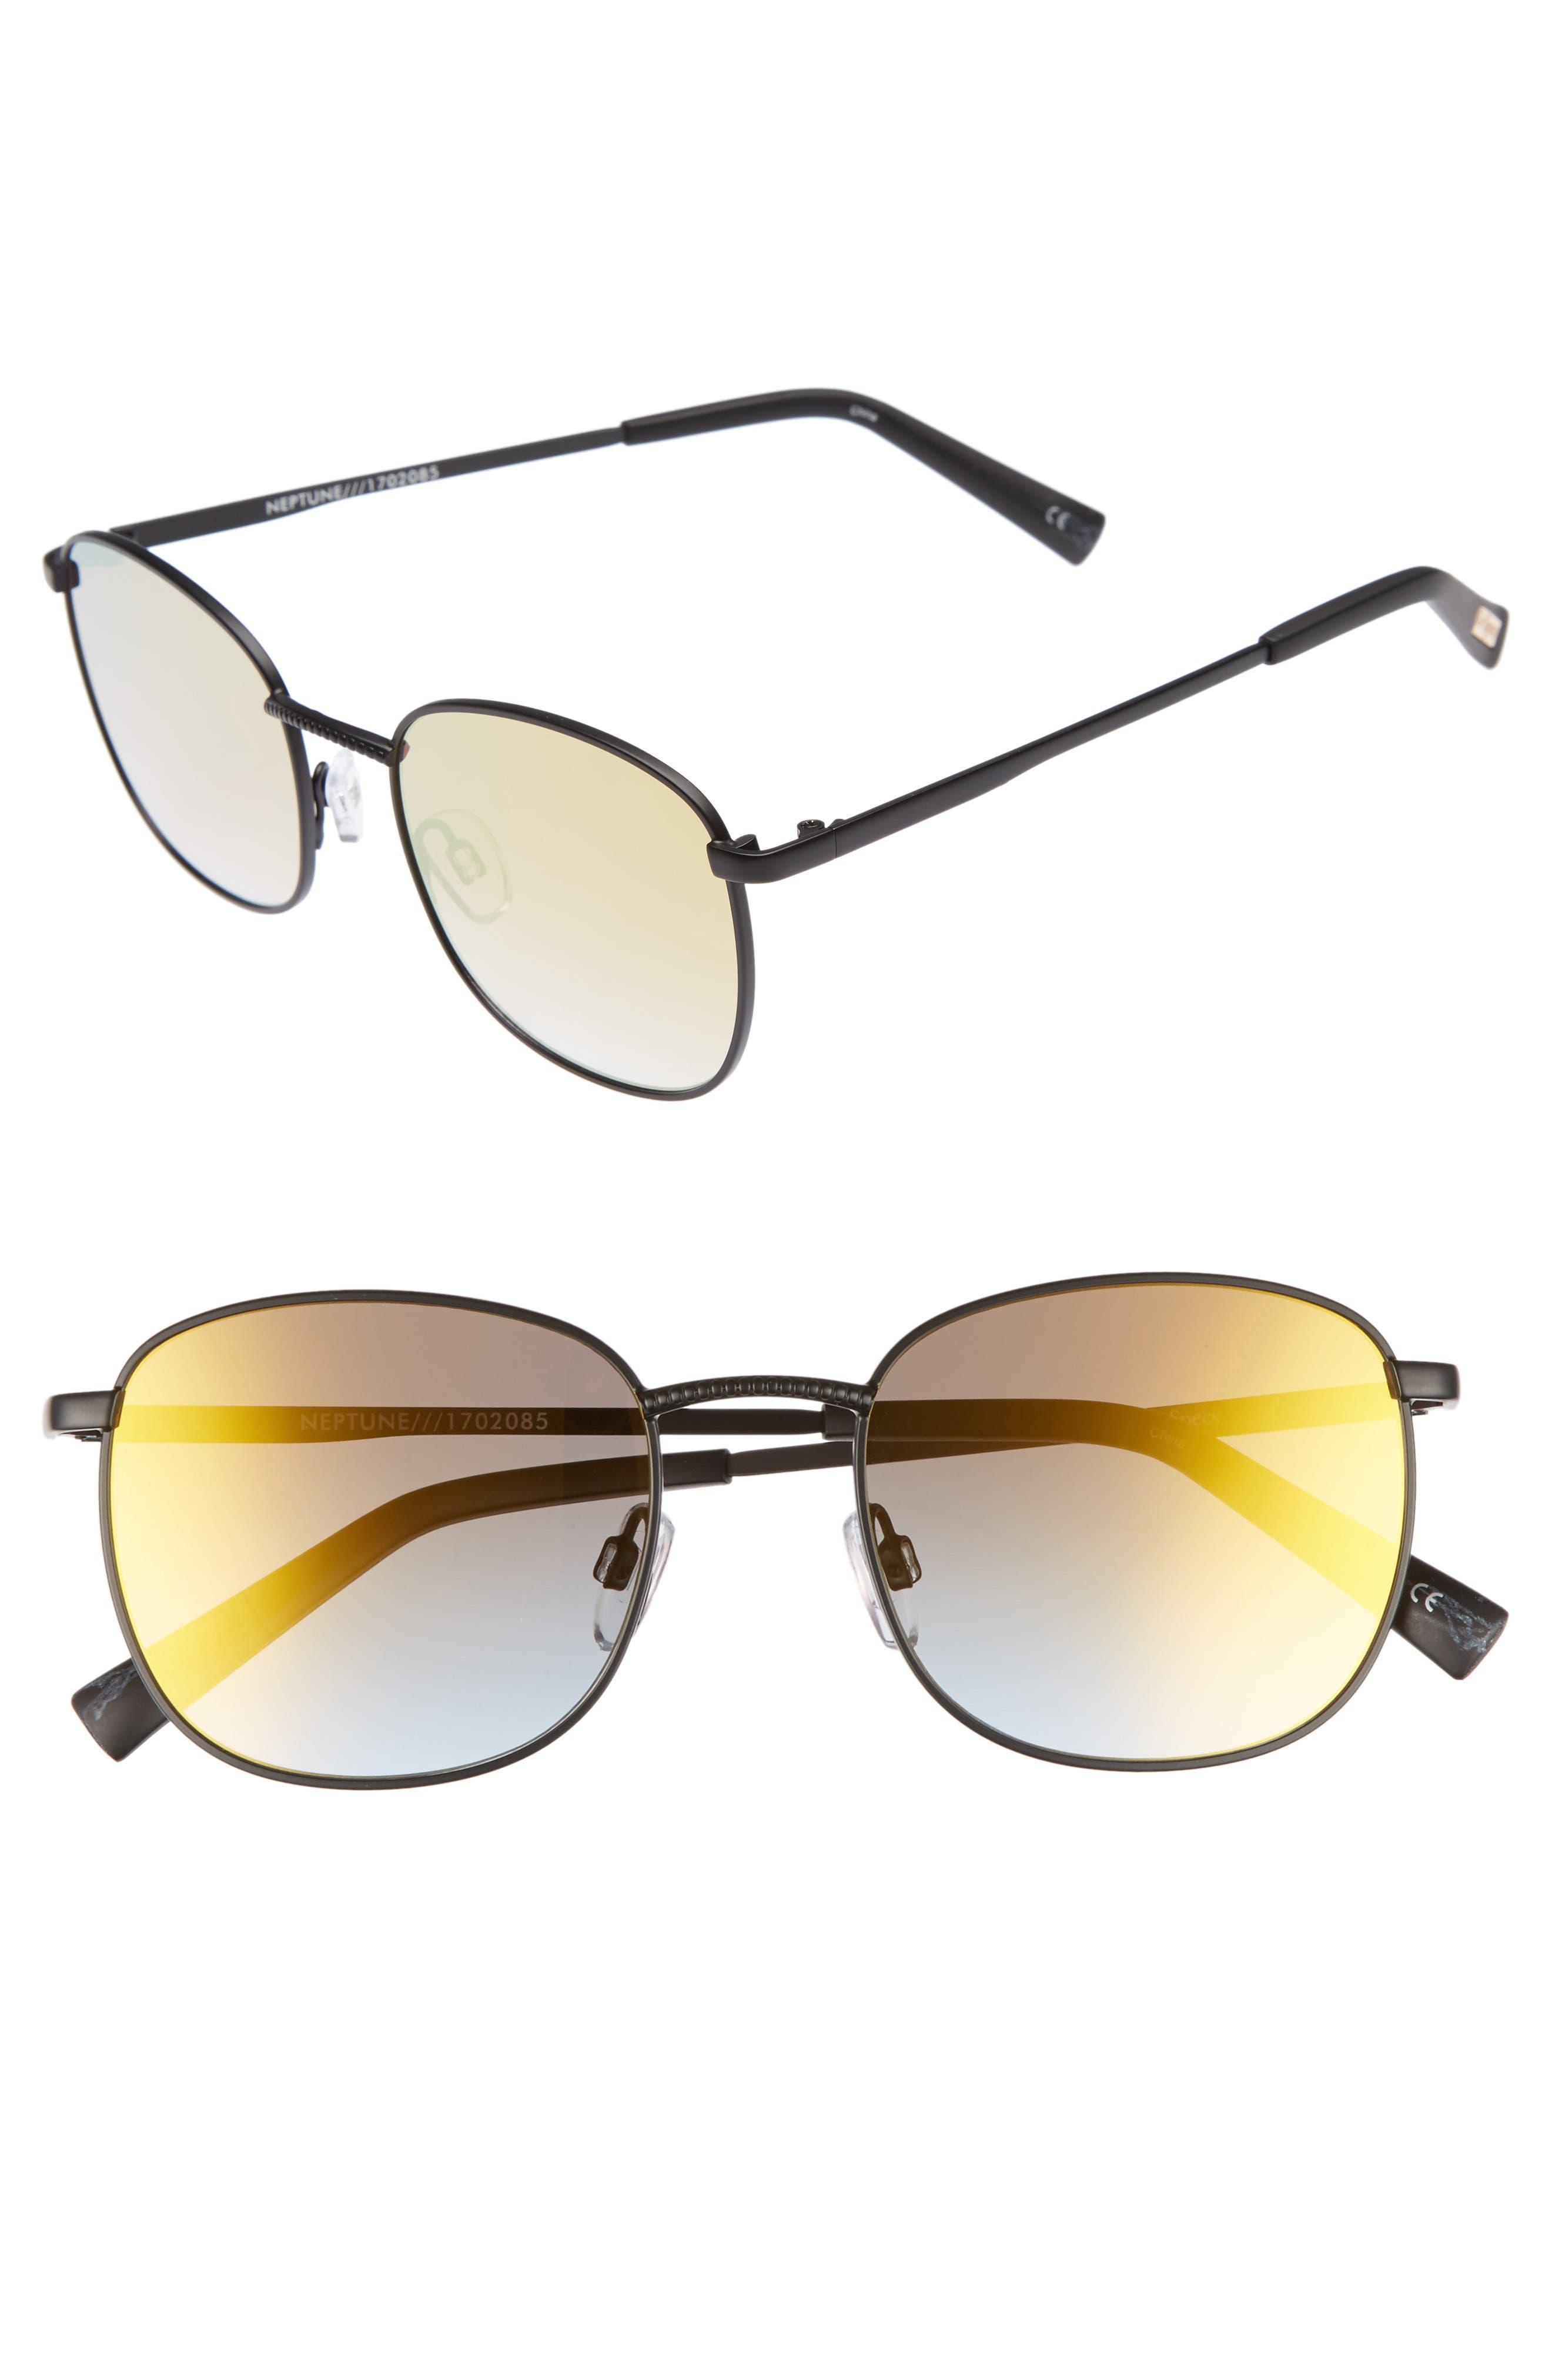 Neptune 49mm Sunglasses,                             Main thumbnail 1, color,                             001